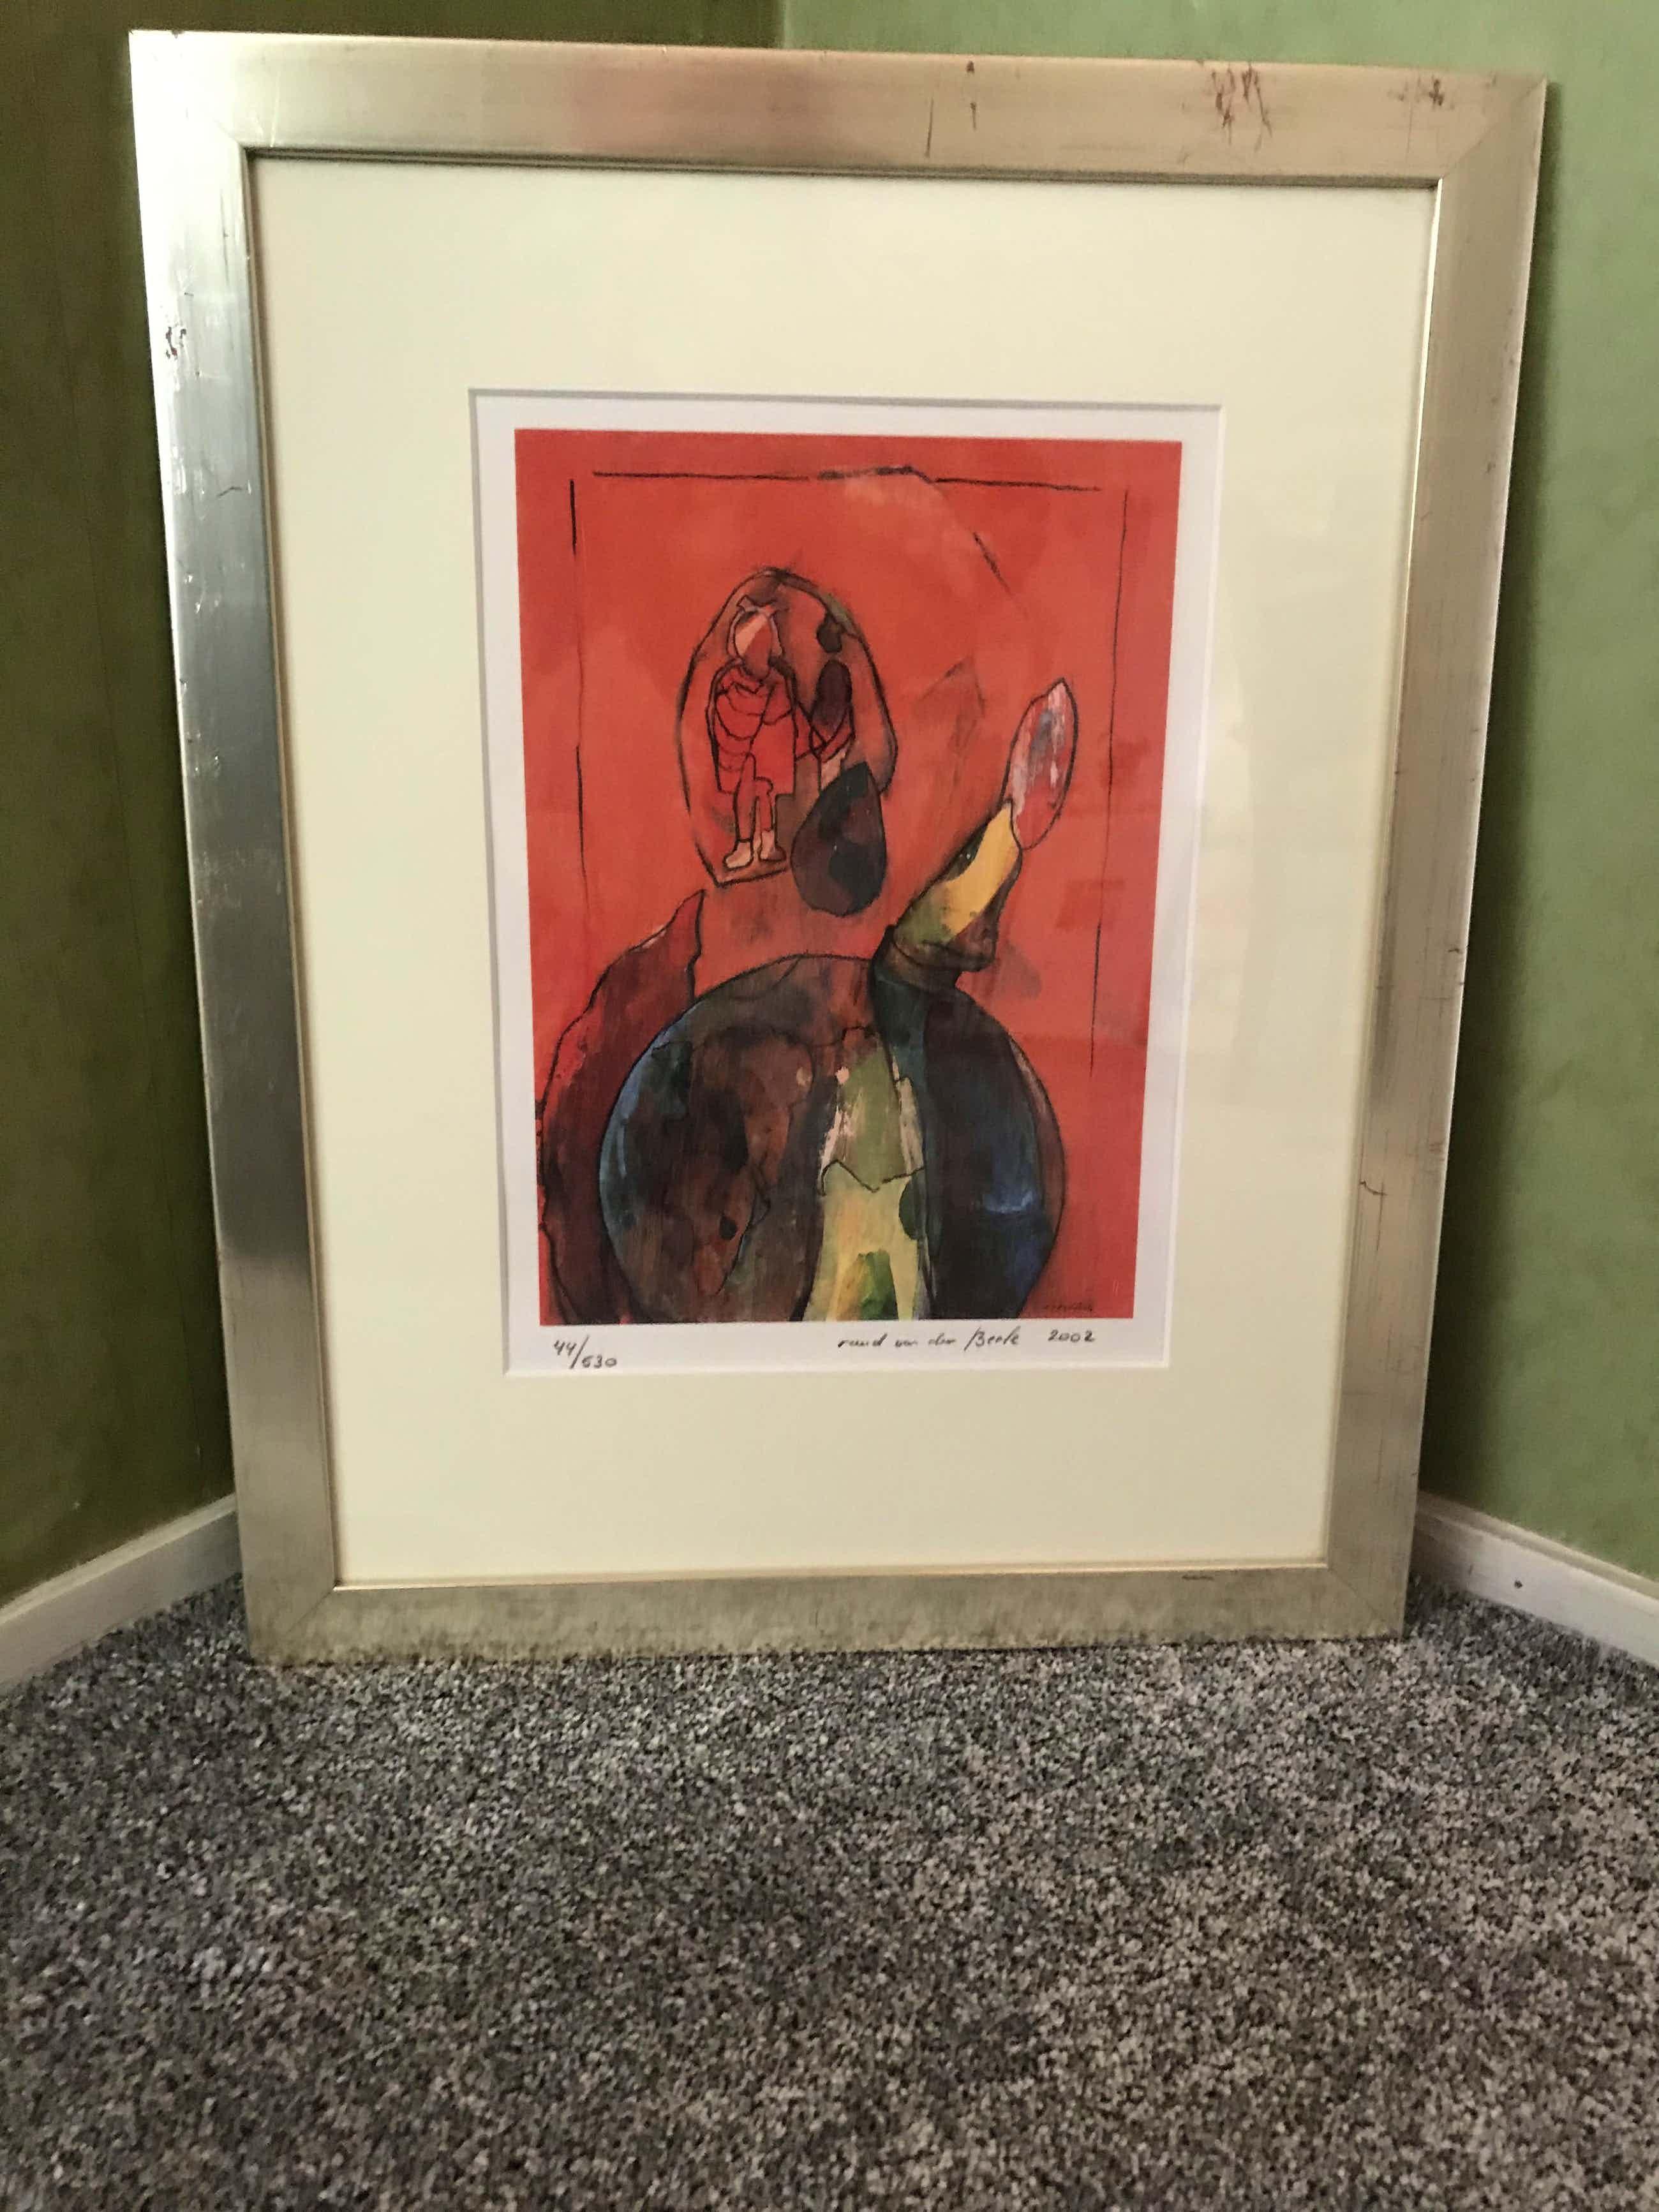 Ruud van der Beele - Abstract - Nr 44 van 530 kopen? Bied vanaf 55!